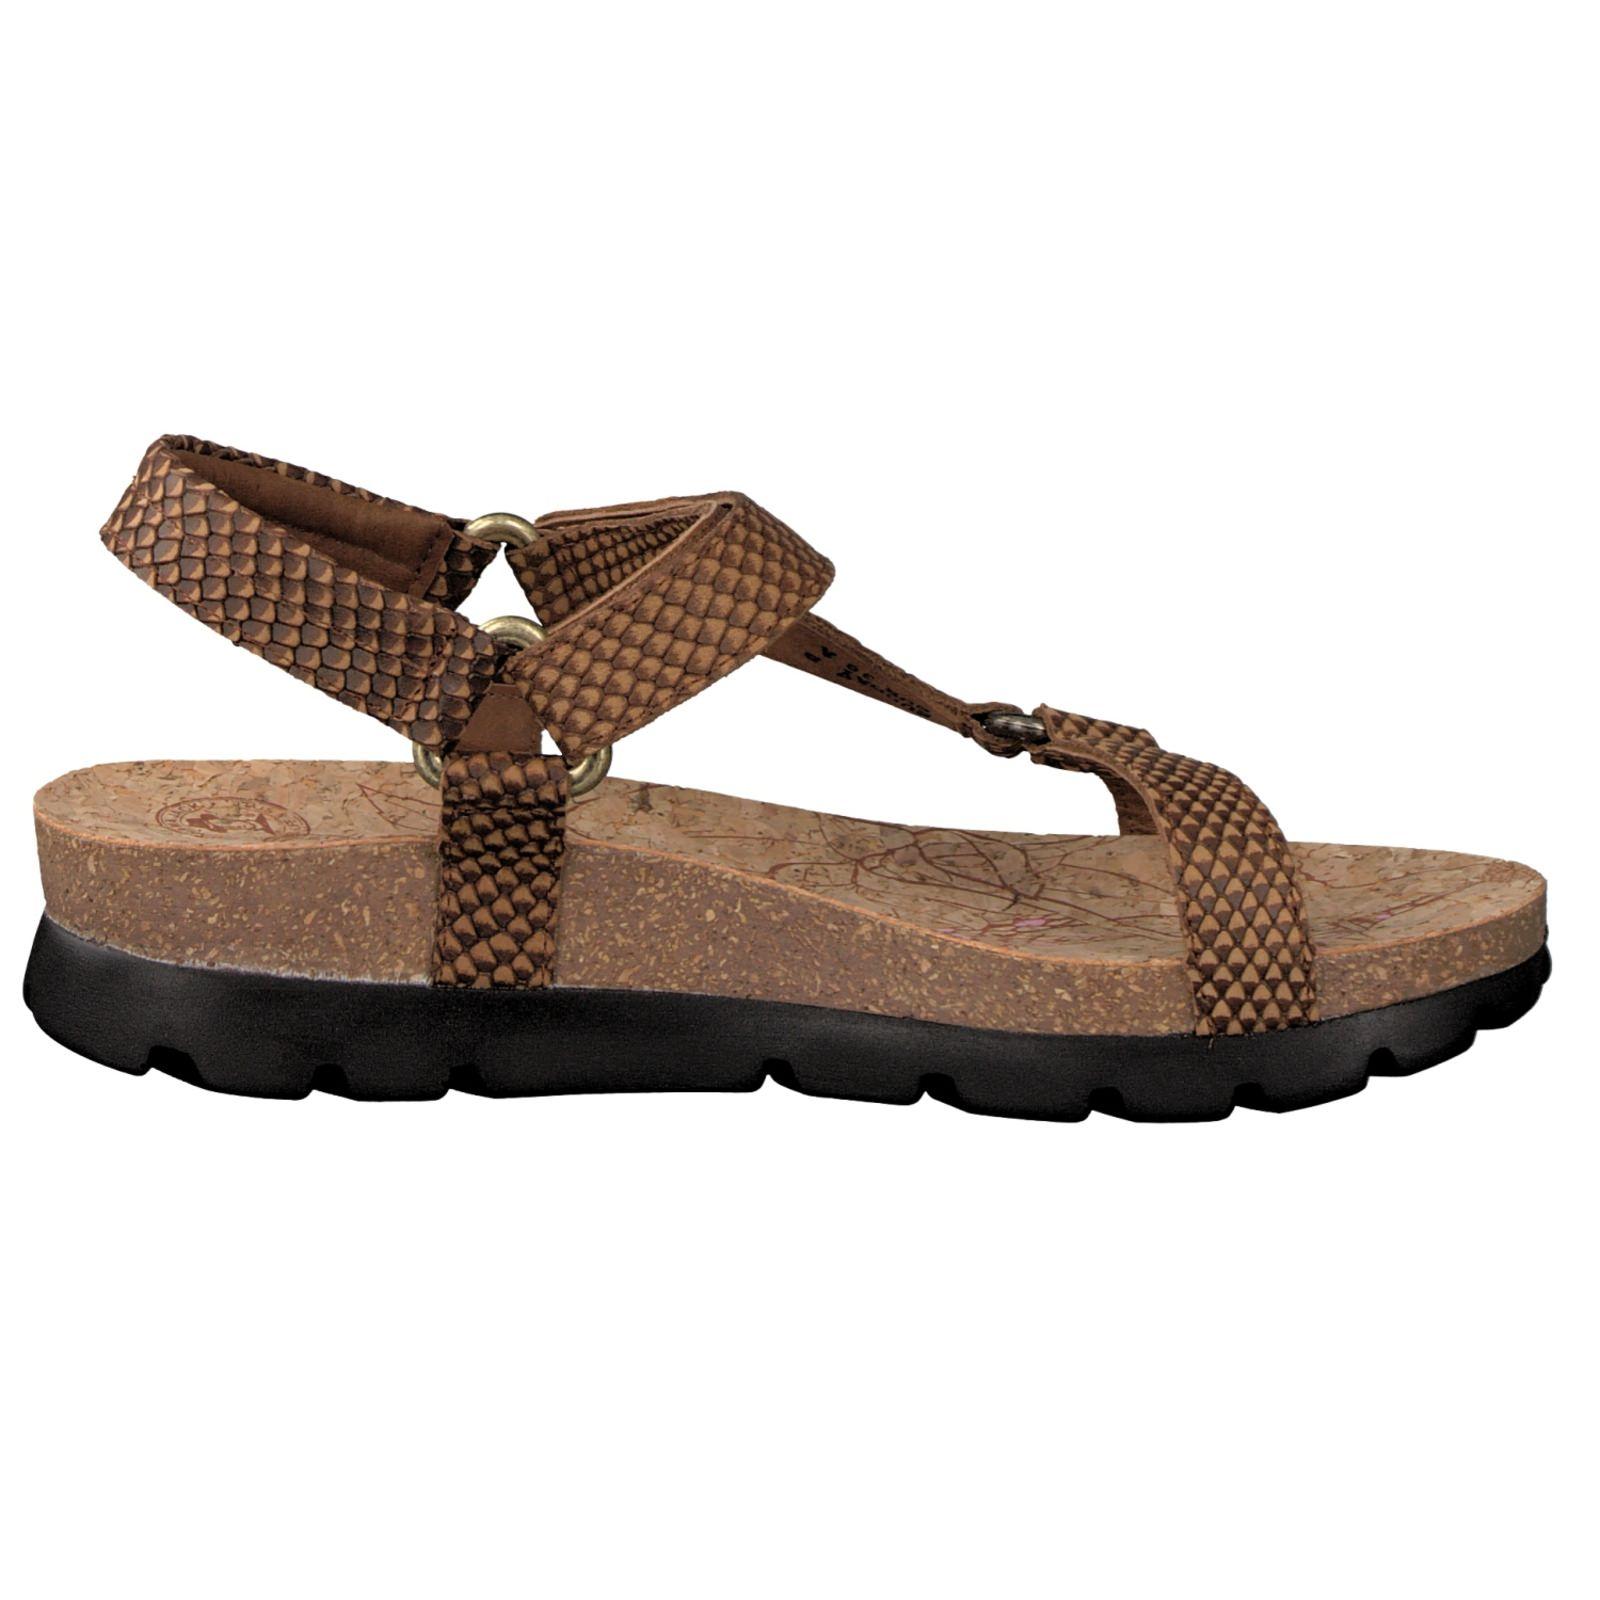 panama jack damen sandale in braun kaufen zumnorde online shop. Black Bedroom Furniture Sets. Home Design Ideas